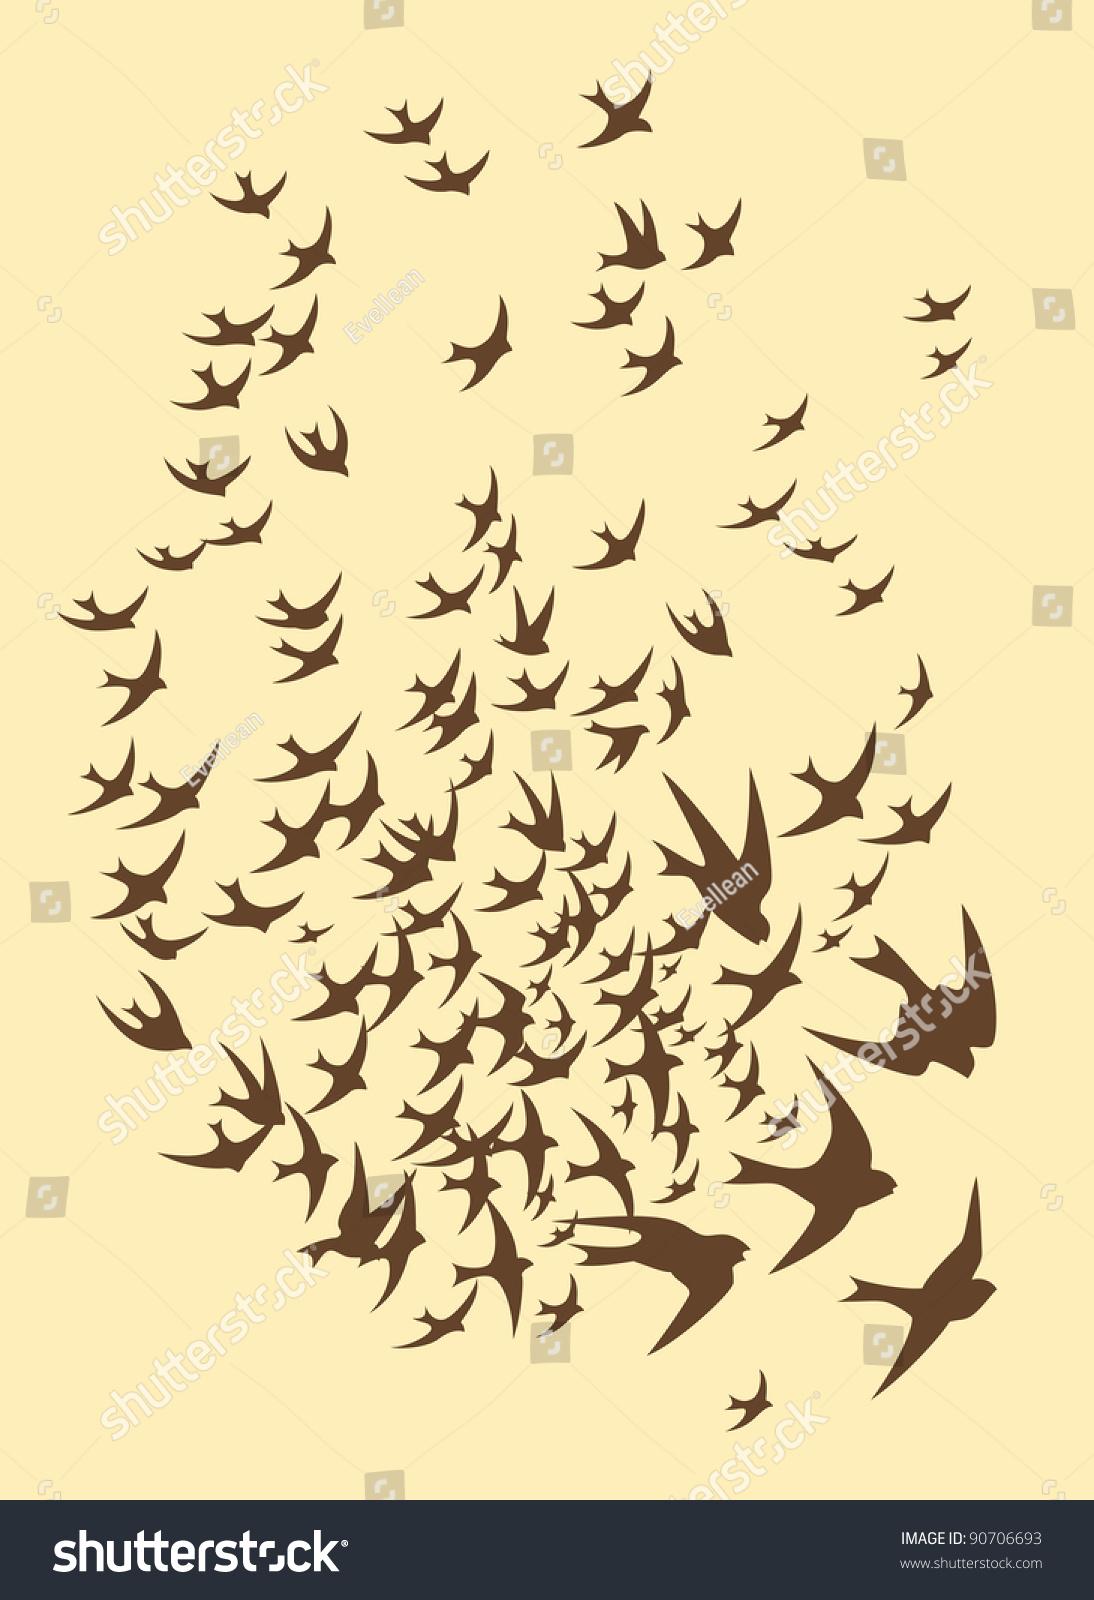 Stock Vector Silhouette Of Flock Birds